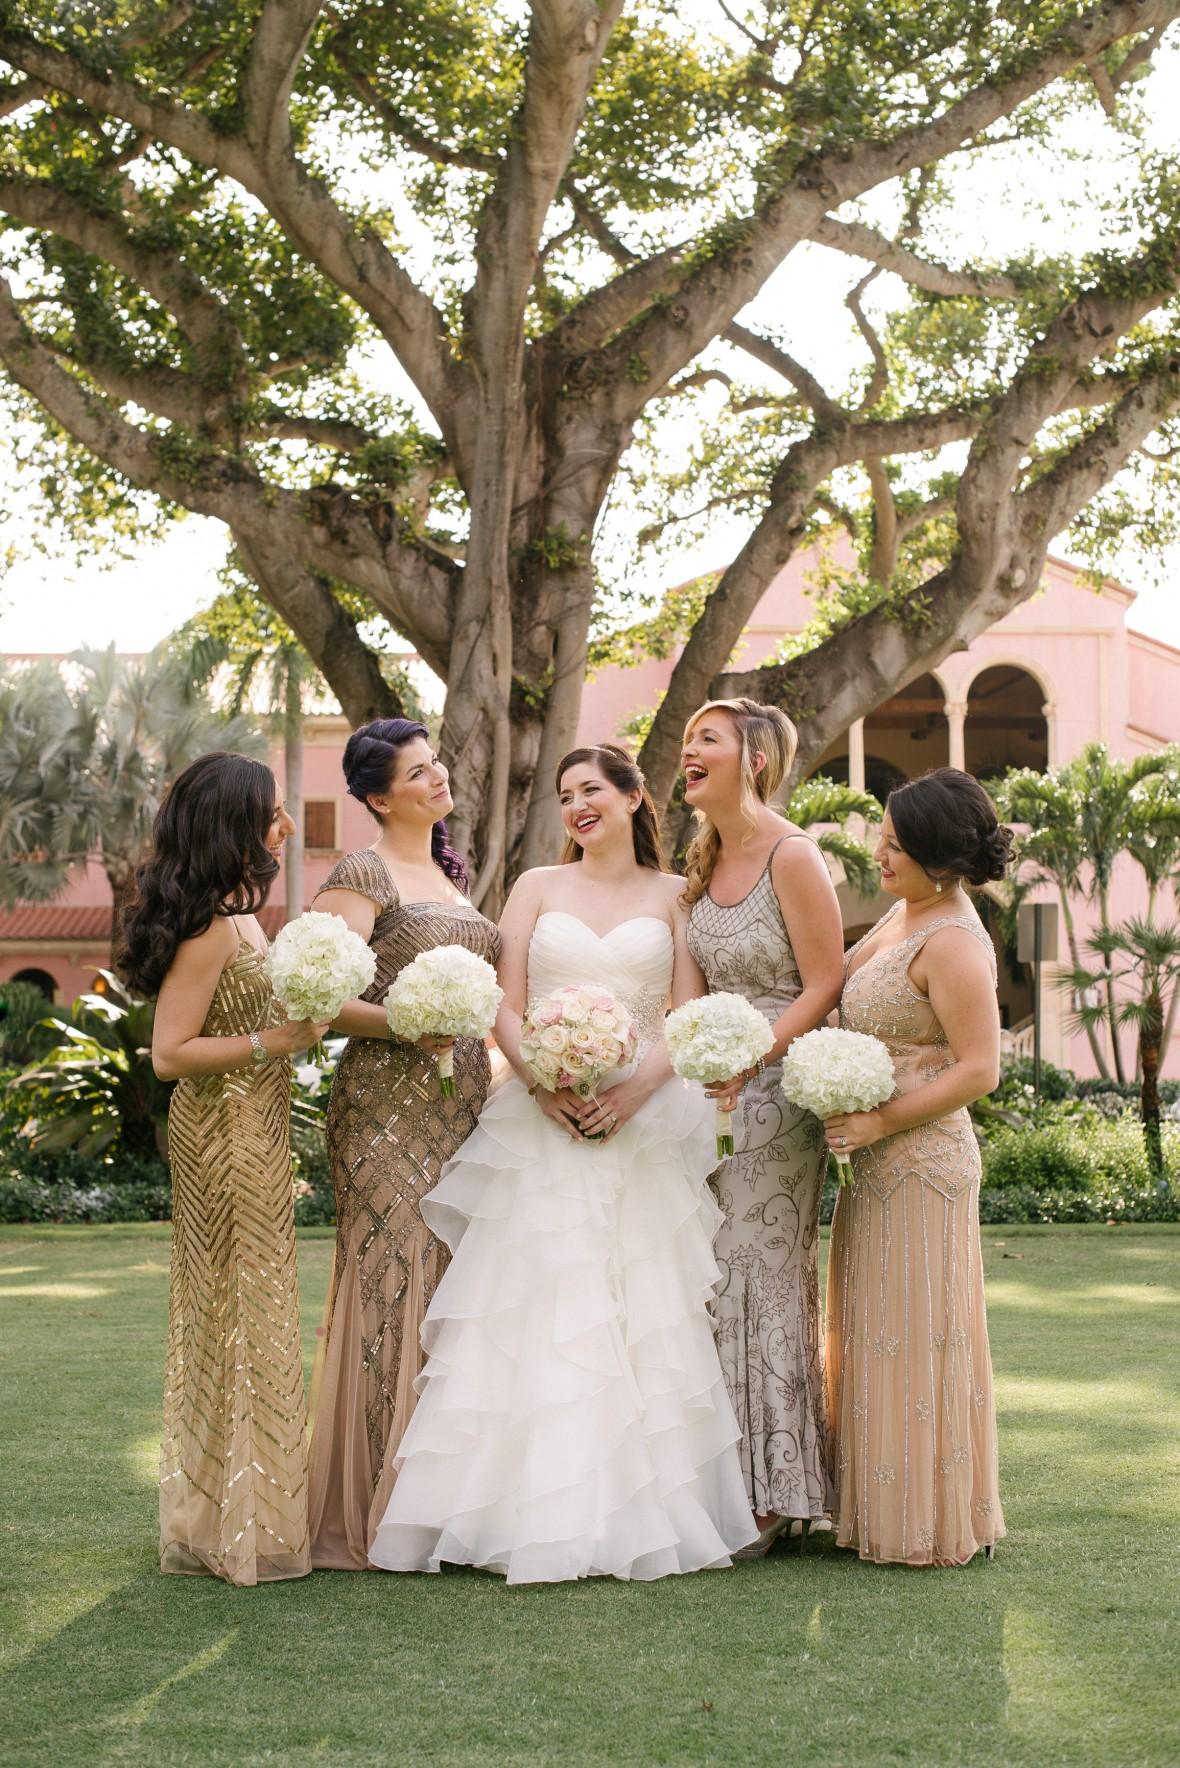 jen glantz professional bridesmaid